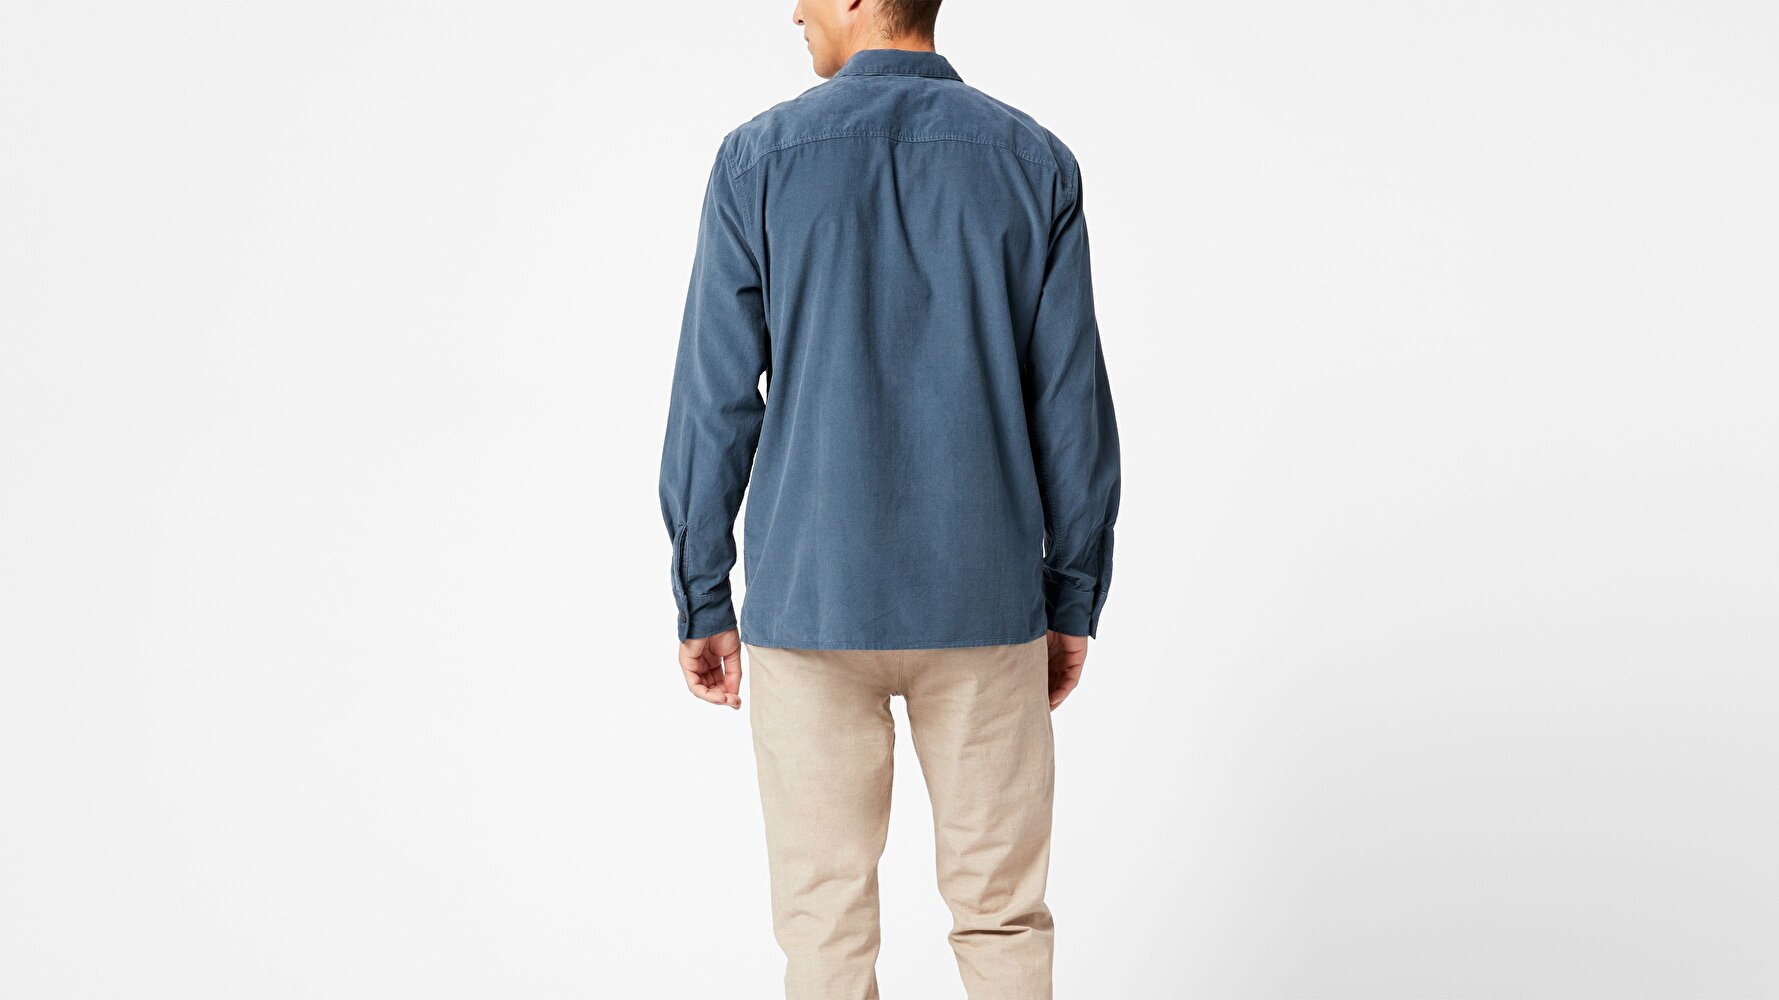 Notched Collar Ceket Gömlek